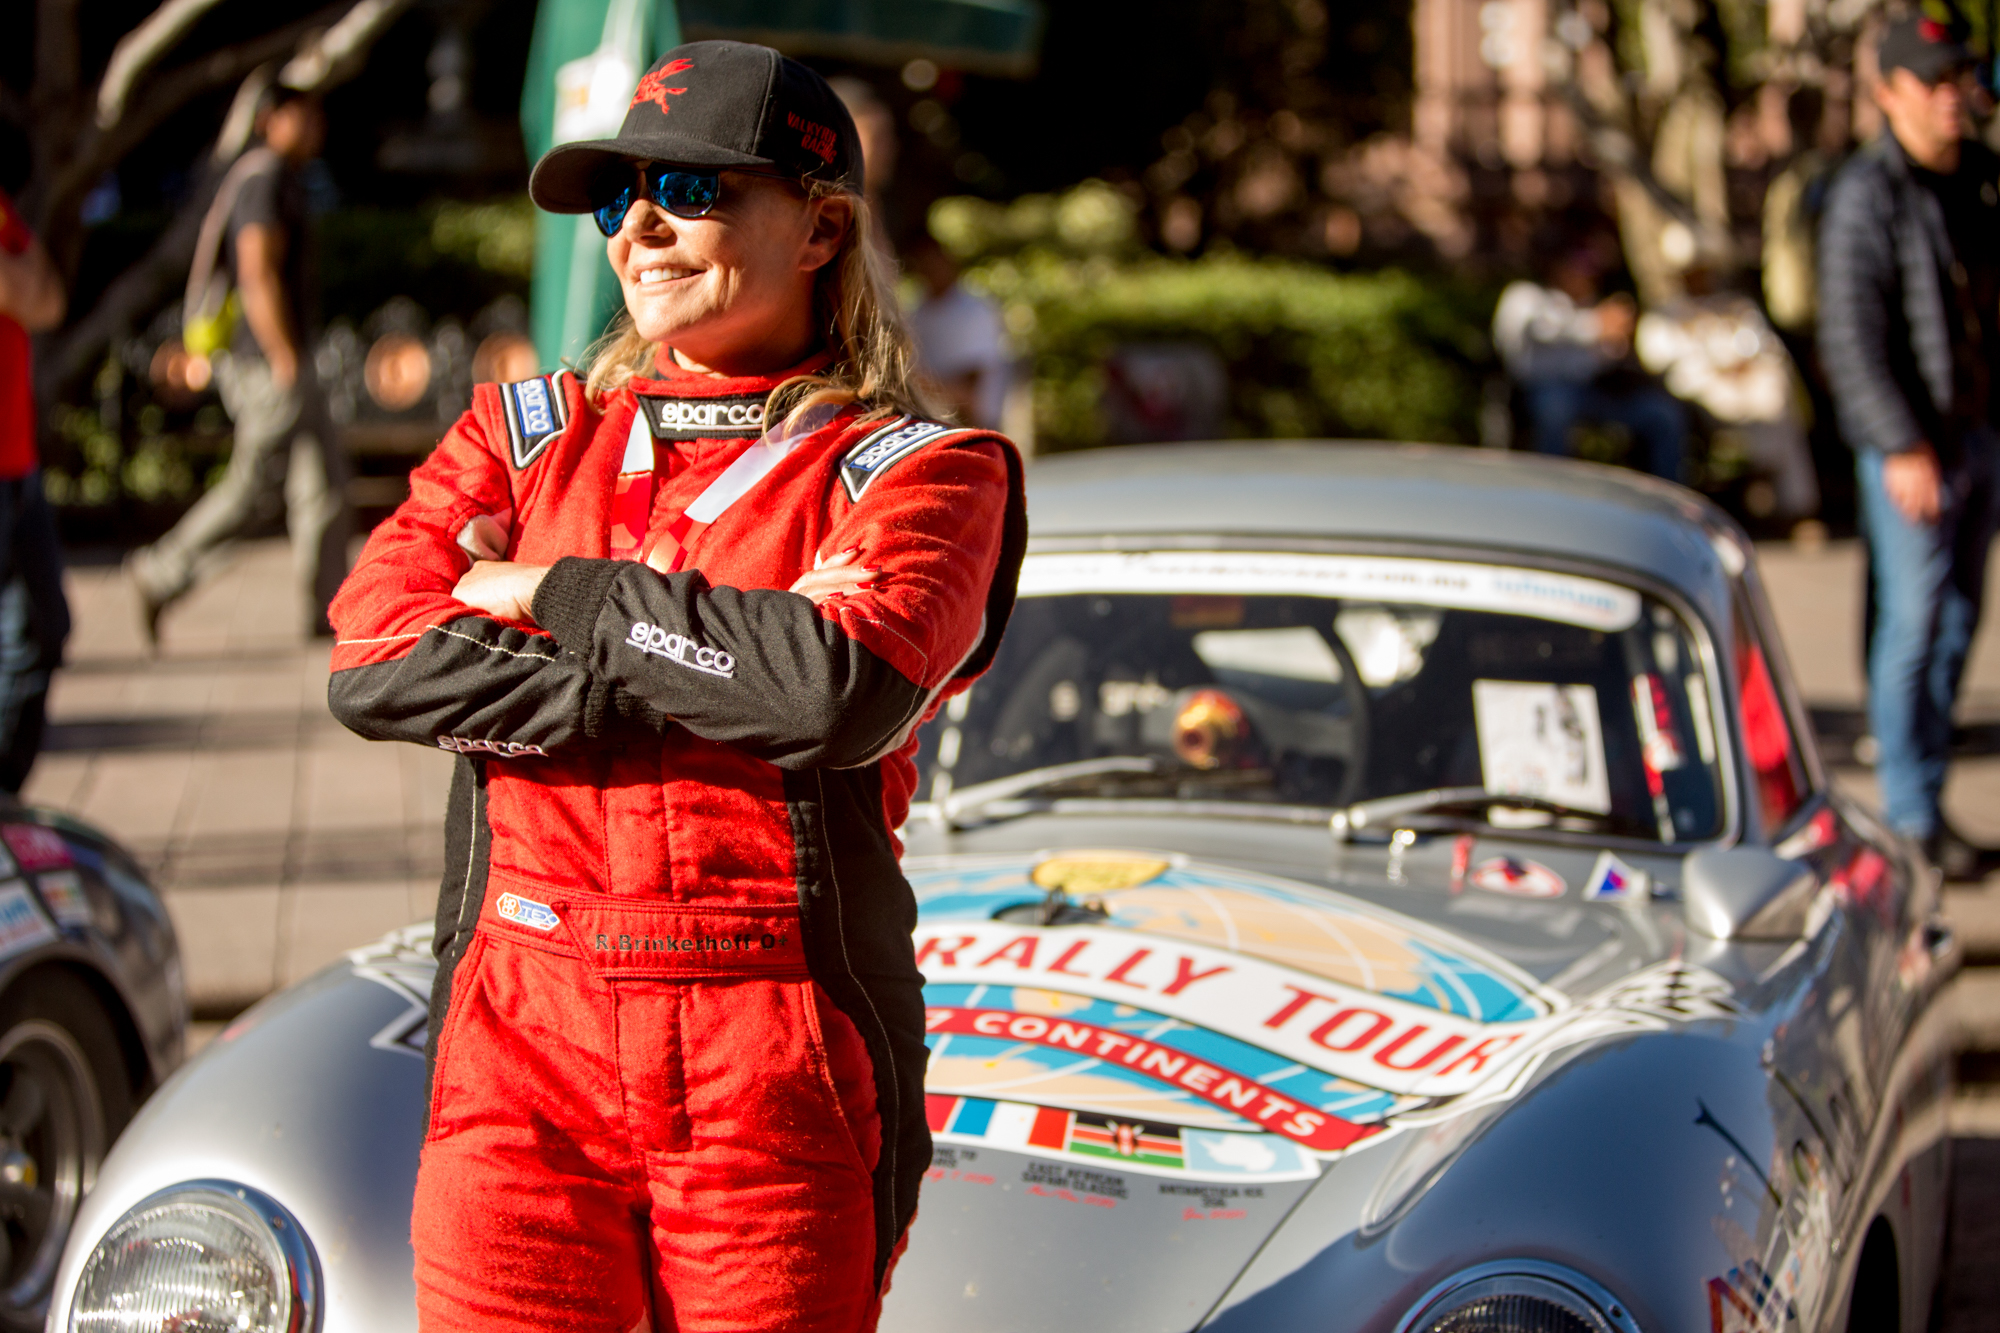 Renée Brinkerhoff began racing at age 57 and has run La Carrera Panamericana four times.